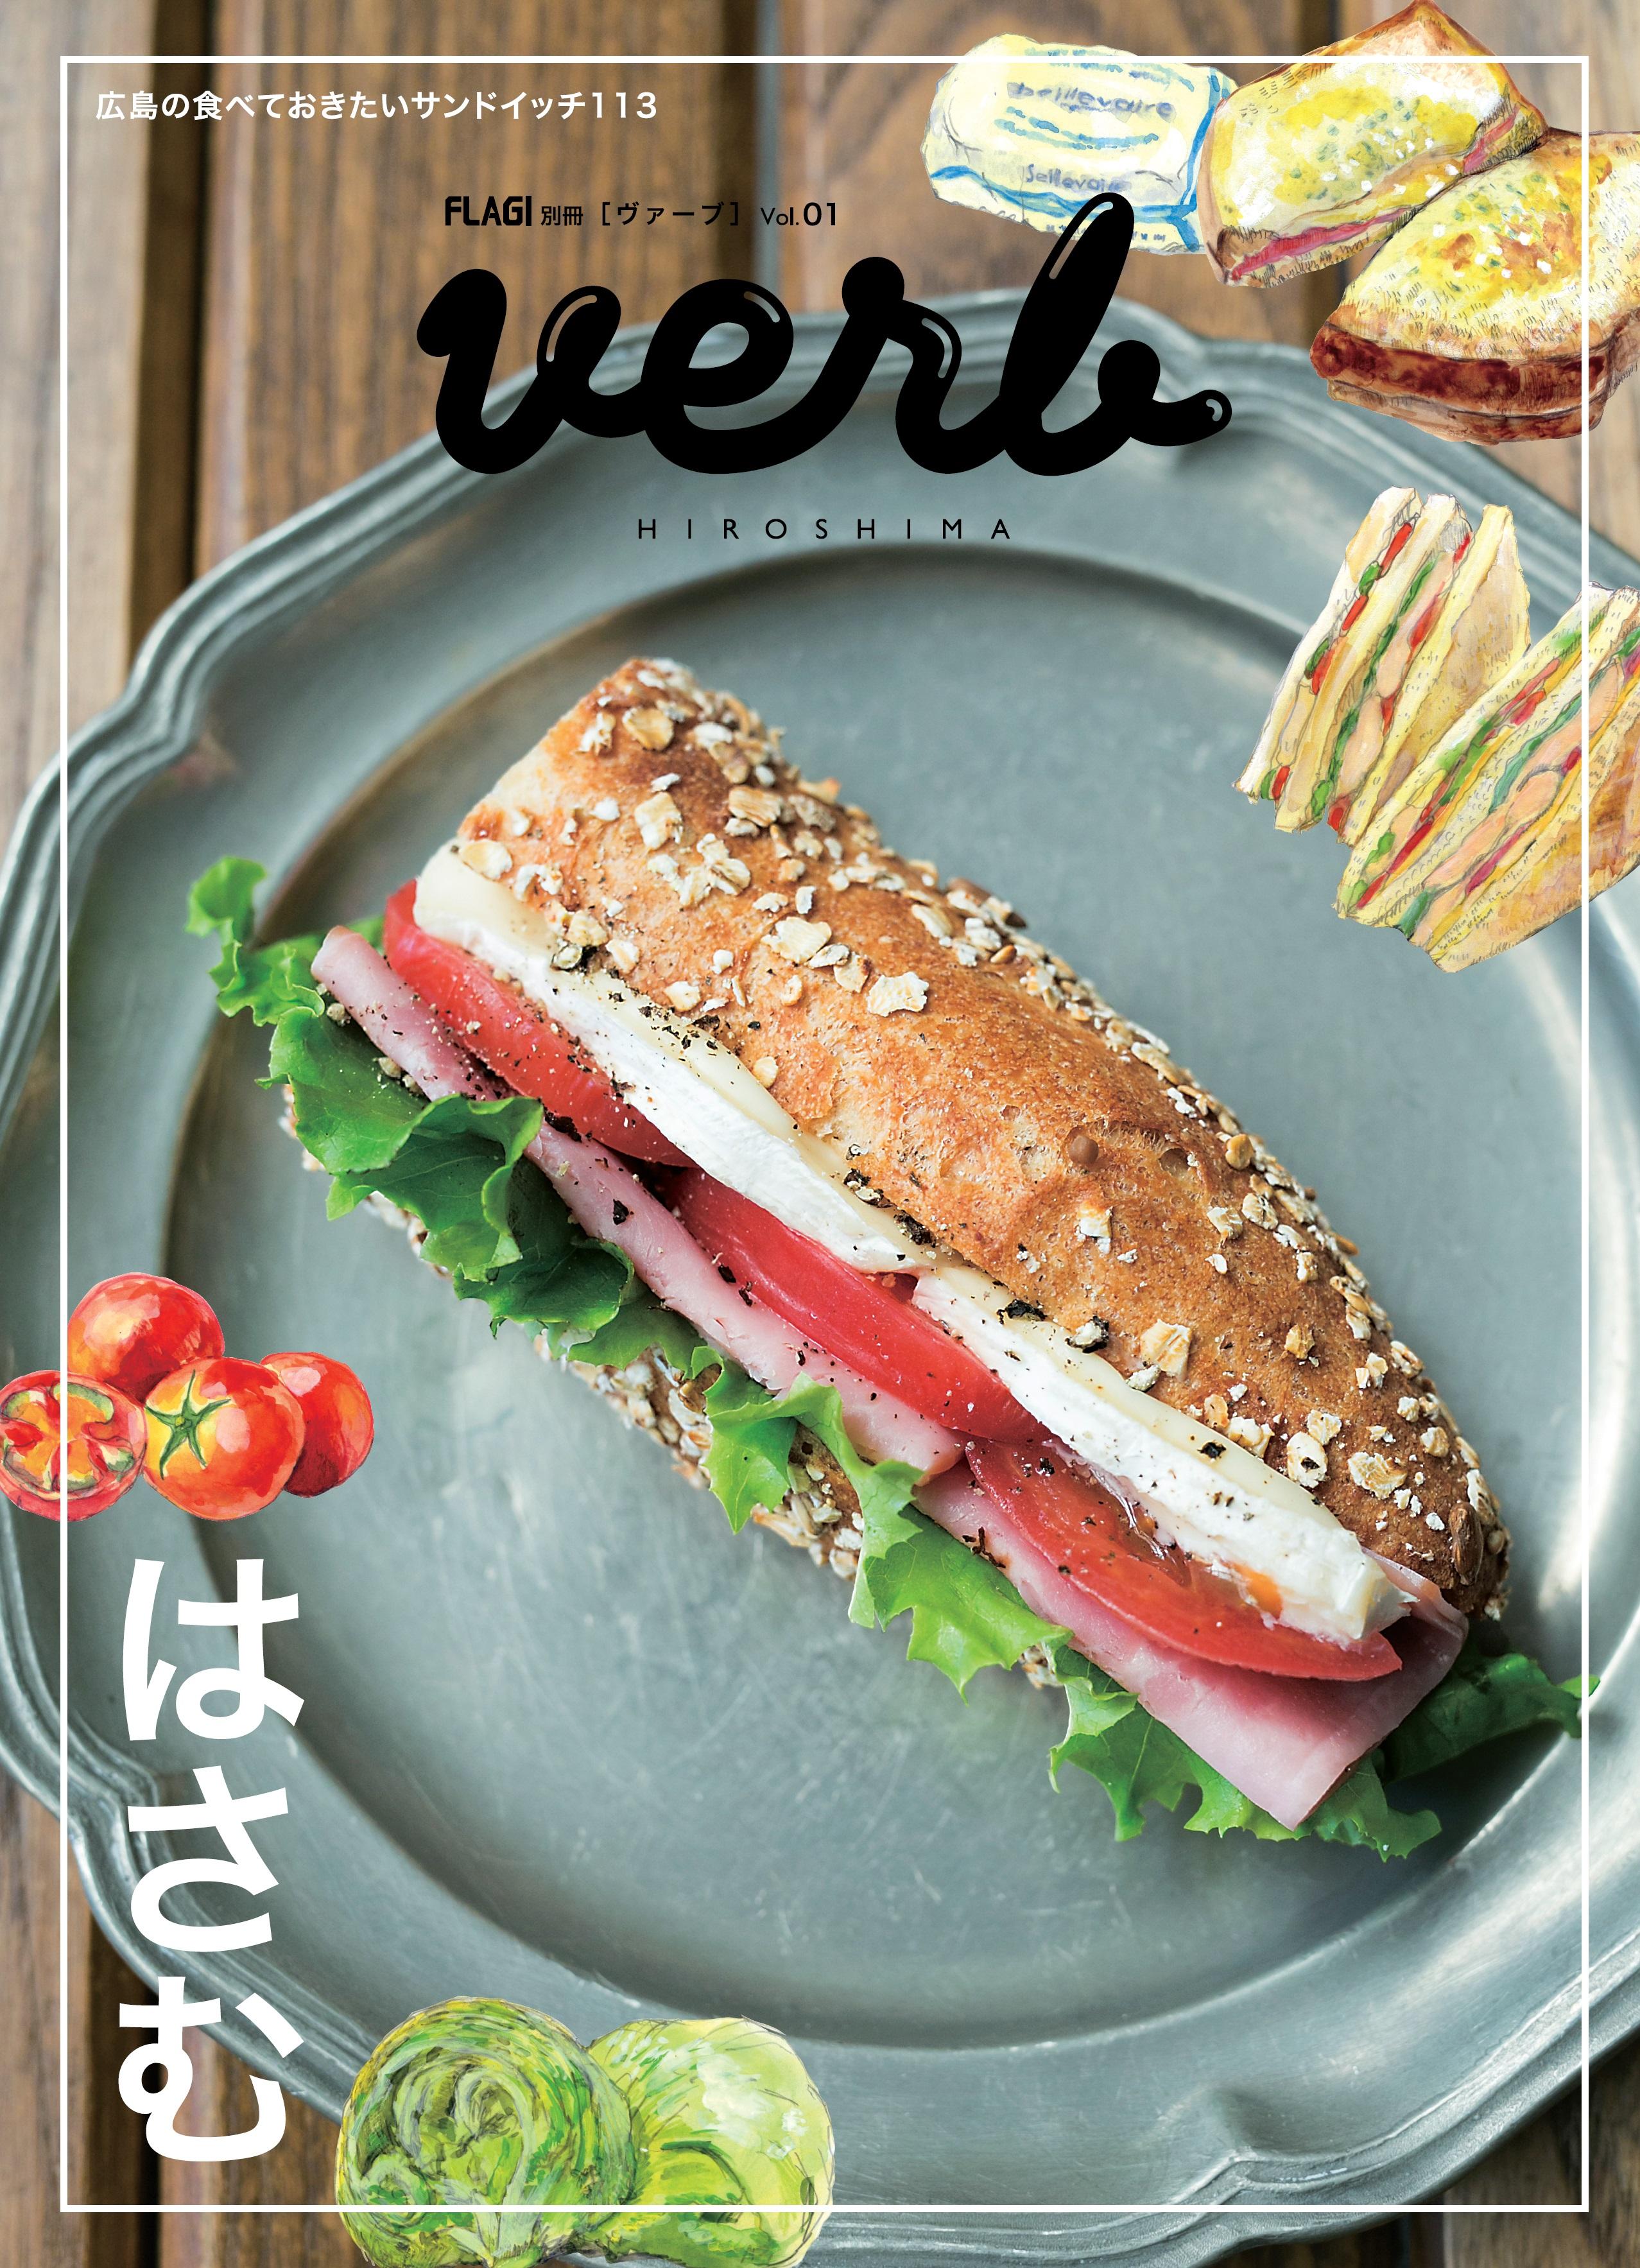 FLAG!別冊 verb vol.01 はさむ 広島の食べておきたいサンドイッチ113